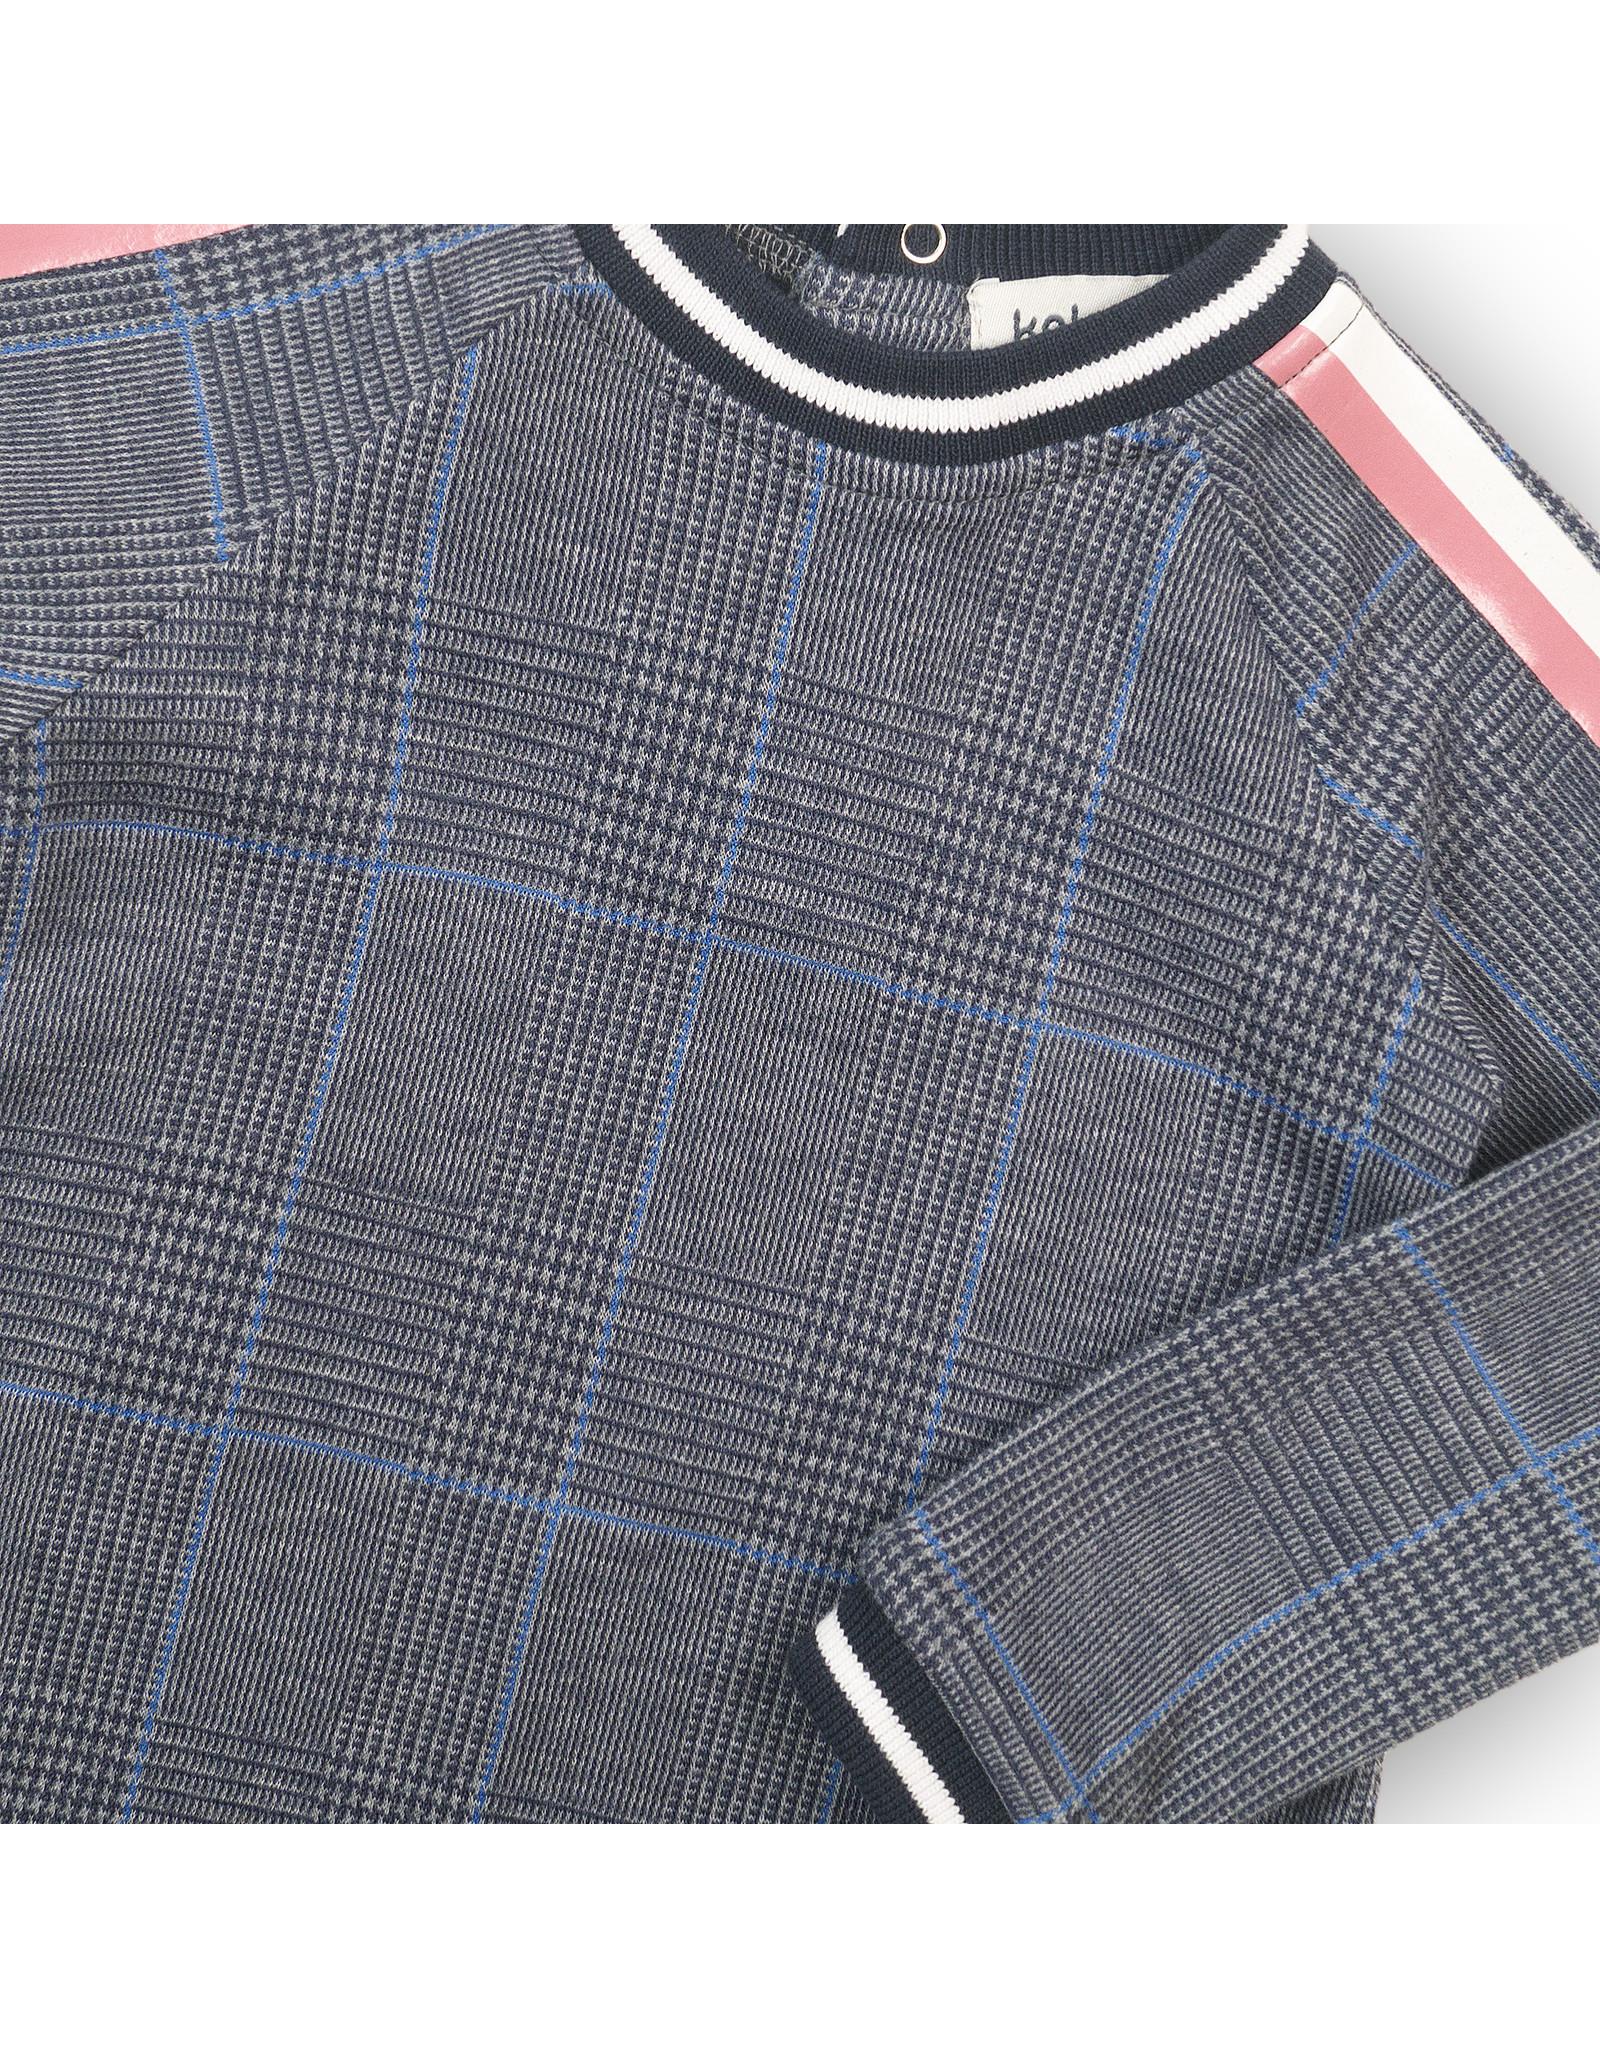 Koko Noko Dress,  Blue check